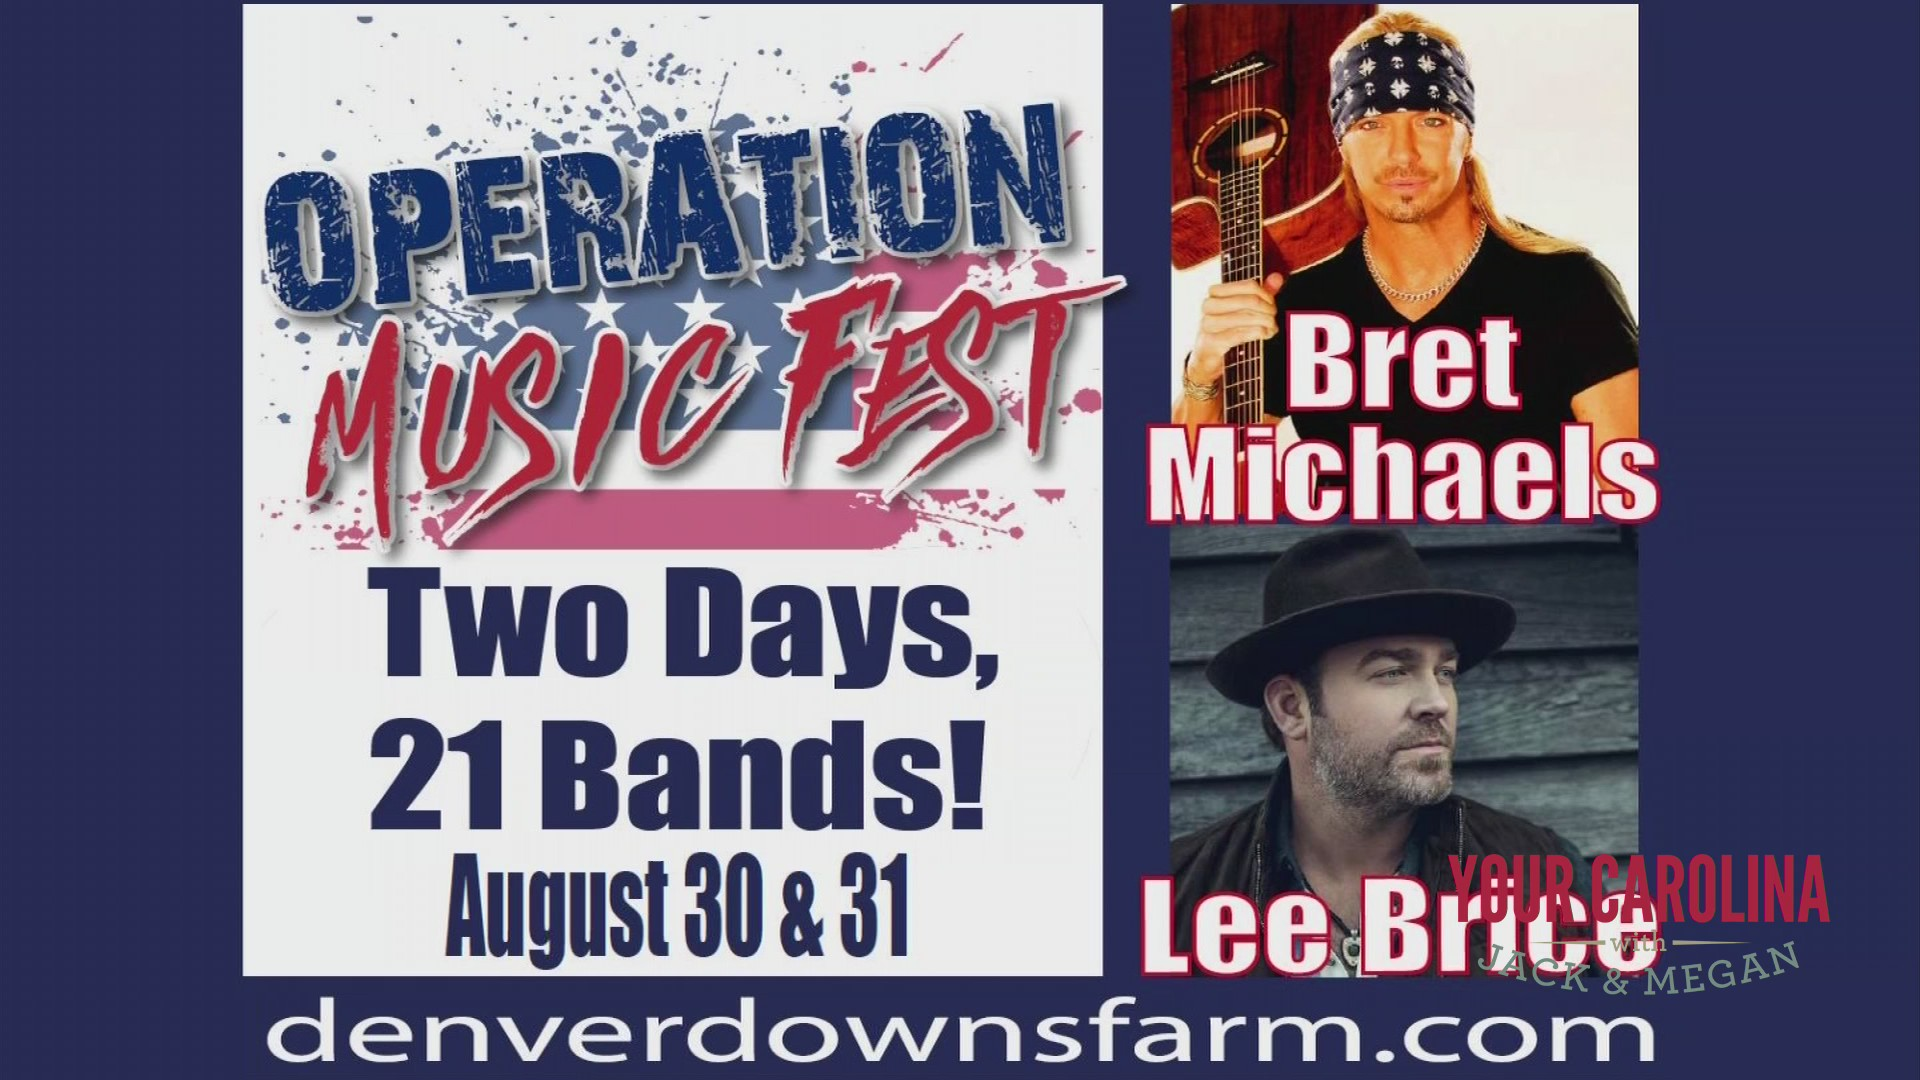 Operation Music Fest